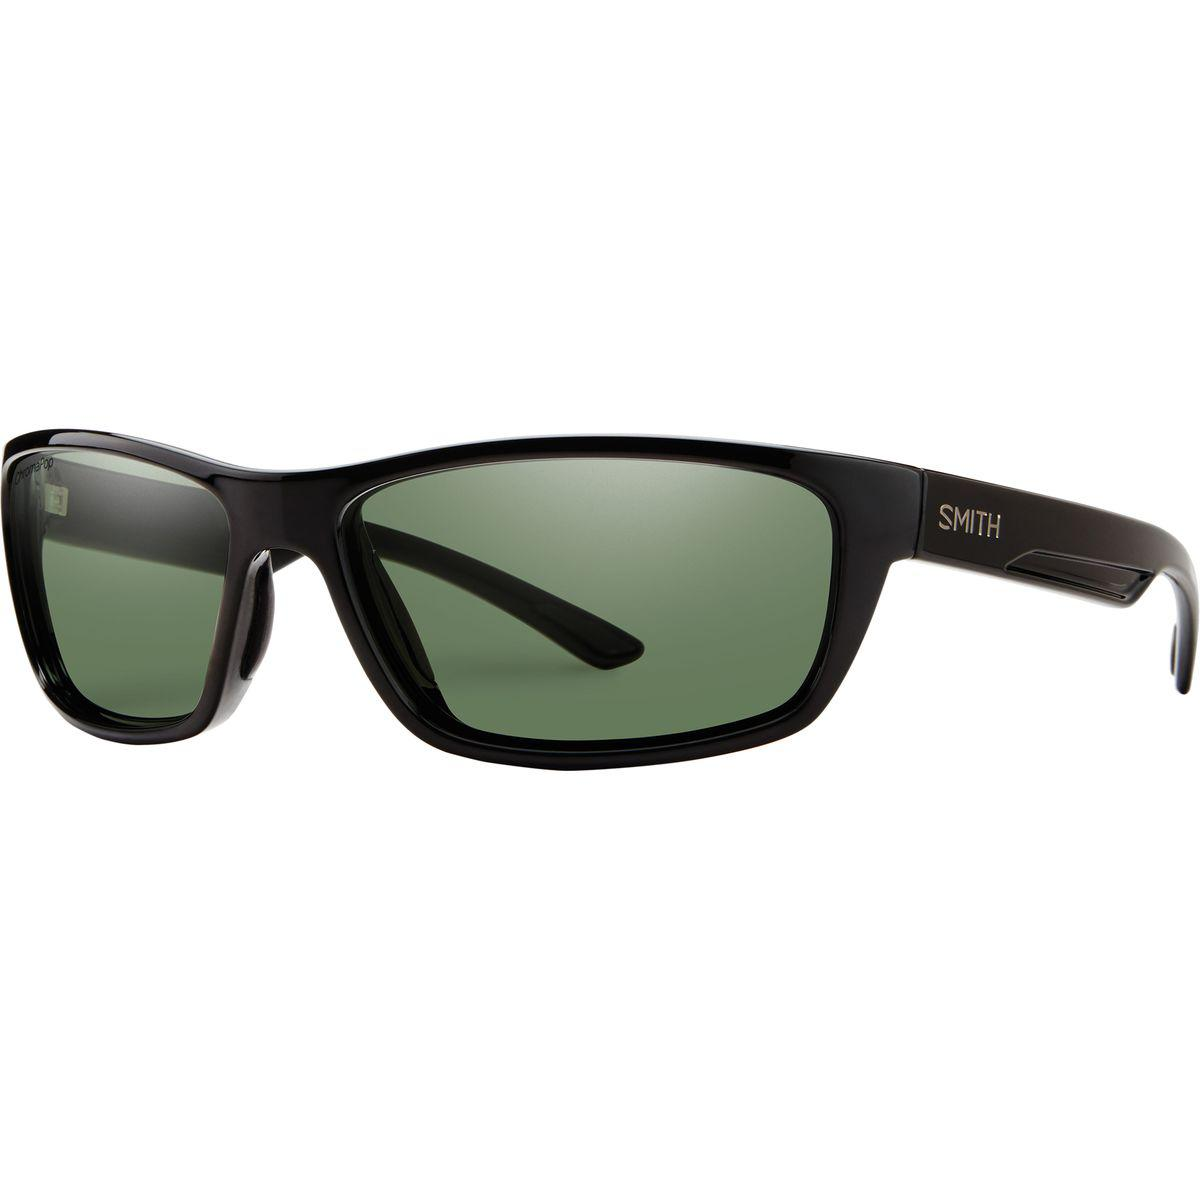 010b1f49d4 Lyst - Smith Ridgewell Chromapop Polarized Sunglasses in Green for Men